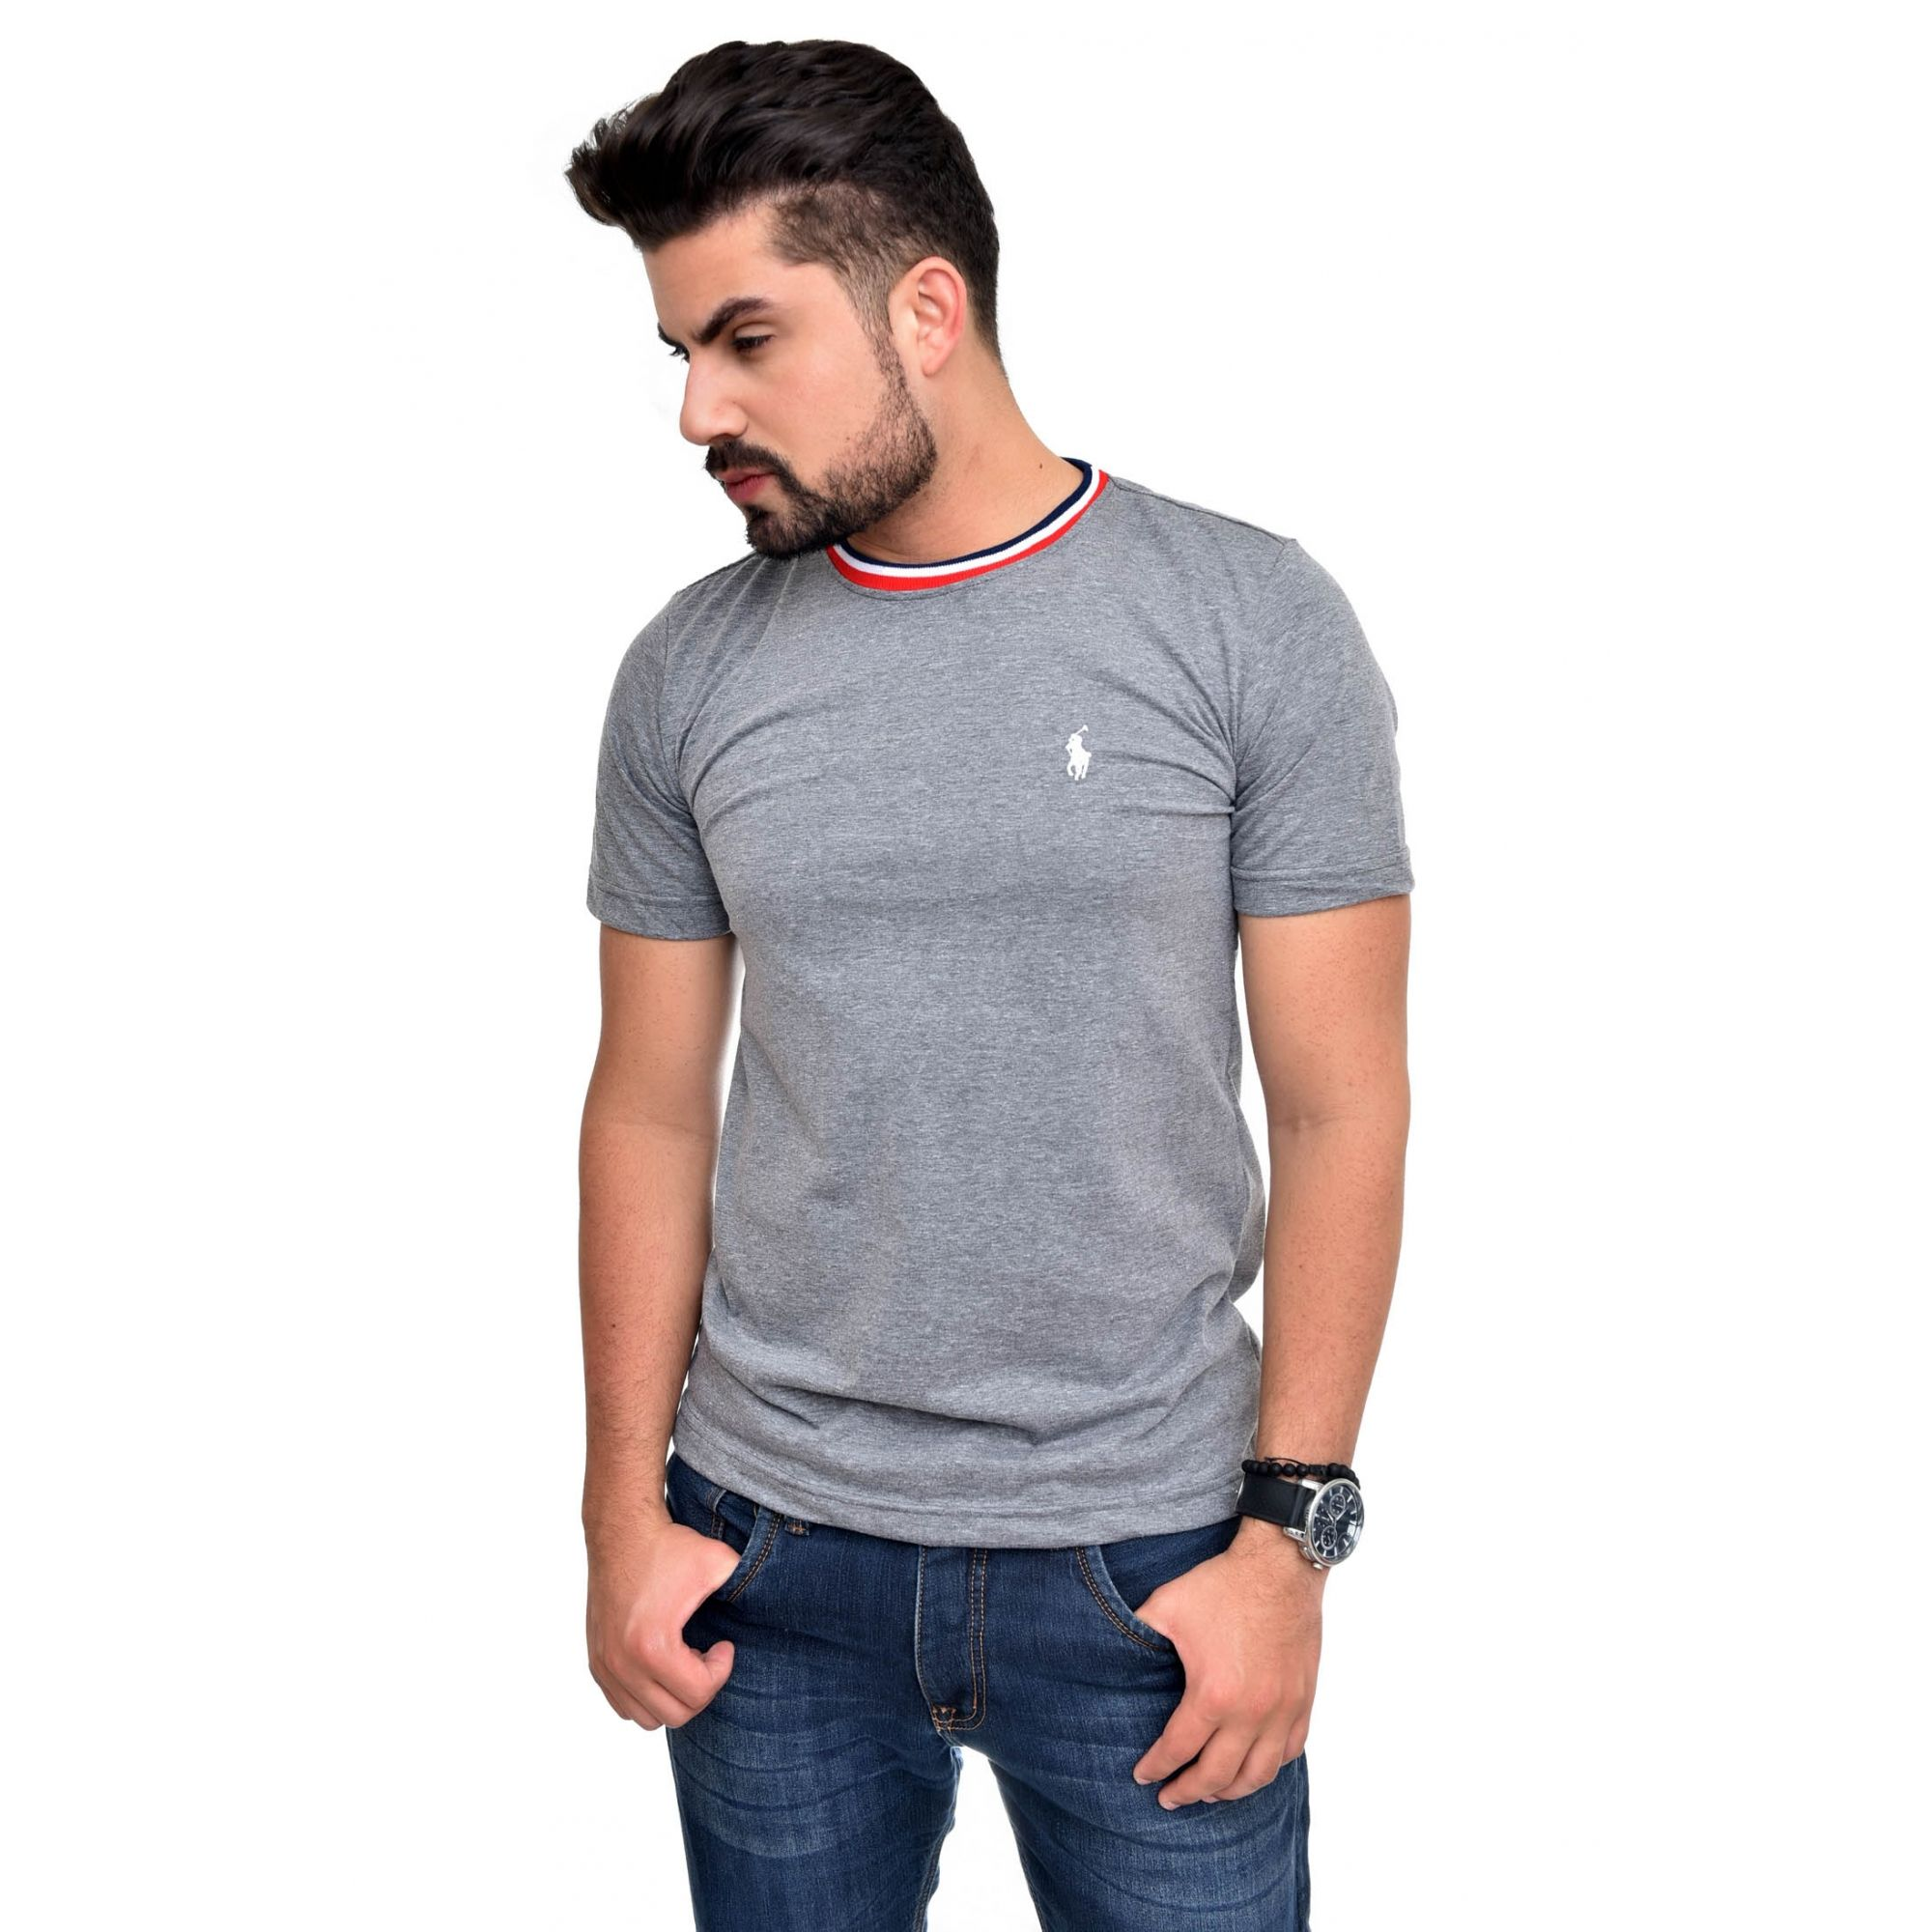 Camiseta RL Mescla Escuro TR